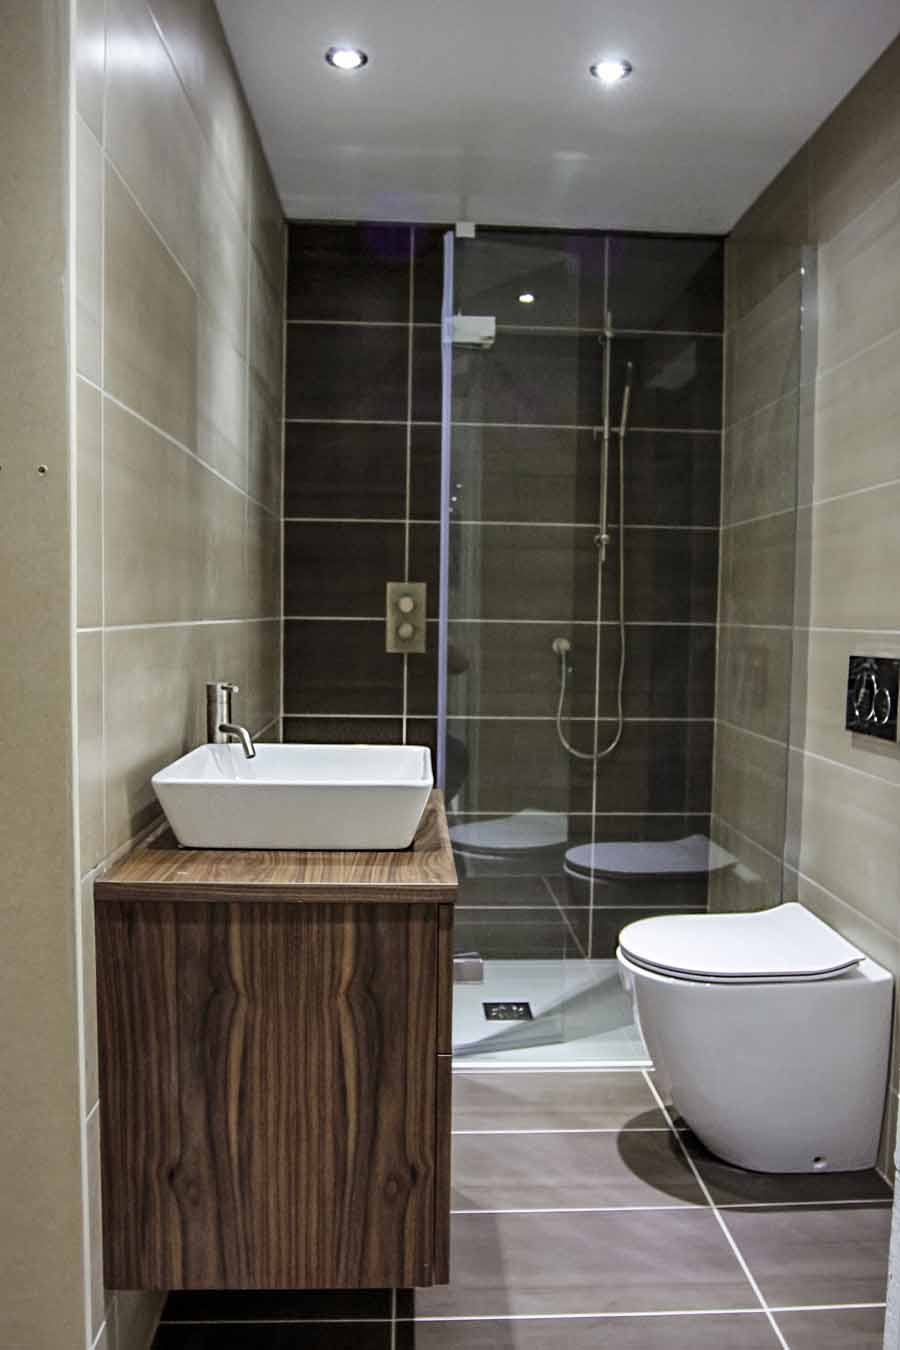 New Dorset Bathroom & Tiles Showroom for Room H2o